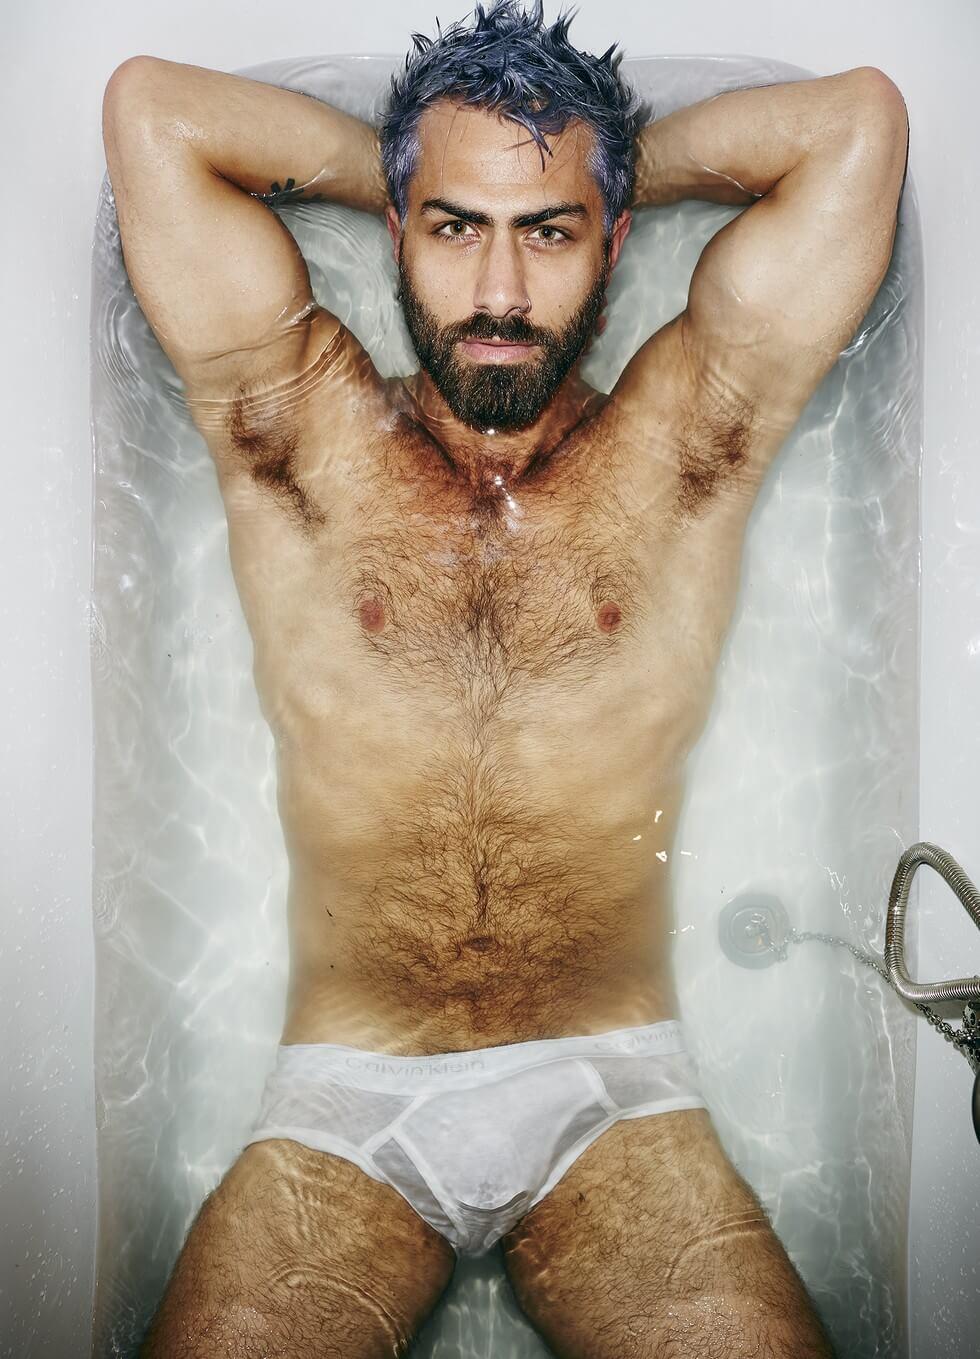 adam_ranzi_pornostar_doccia_nudo